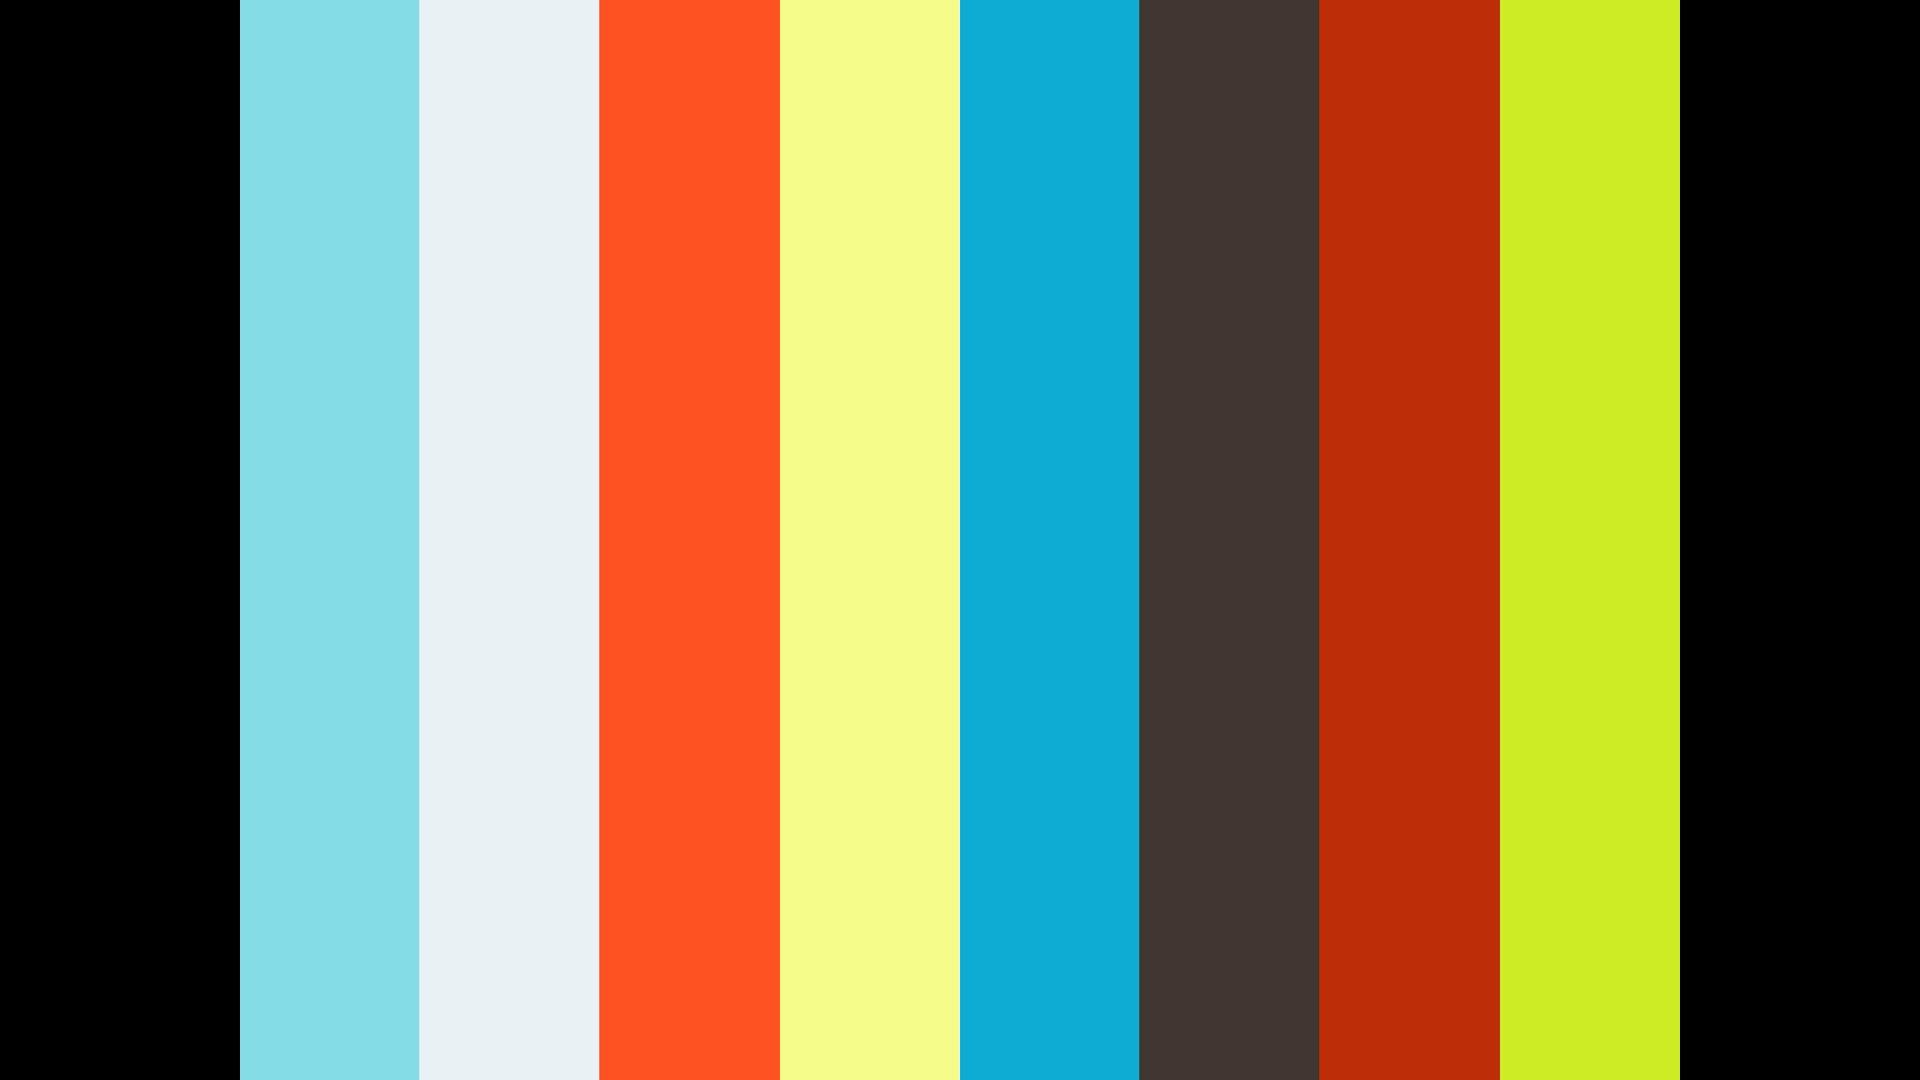 [ critics ] - Season 1- Webisode 1- Artistic Shorts & 1,000 Words